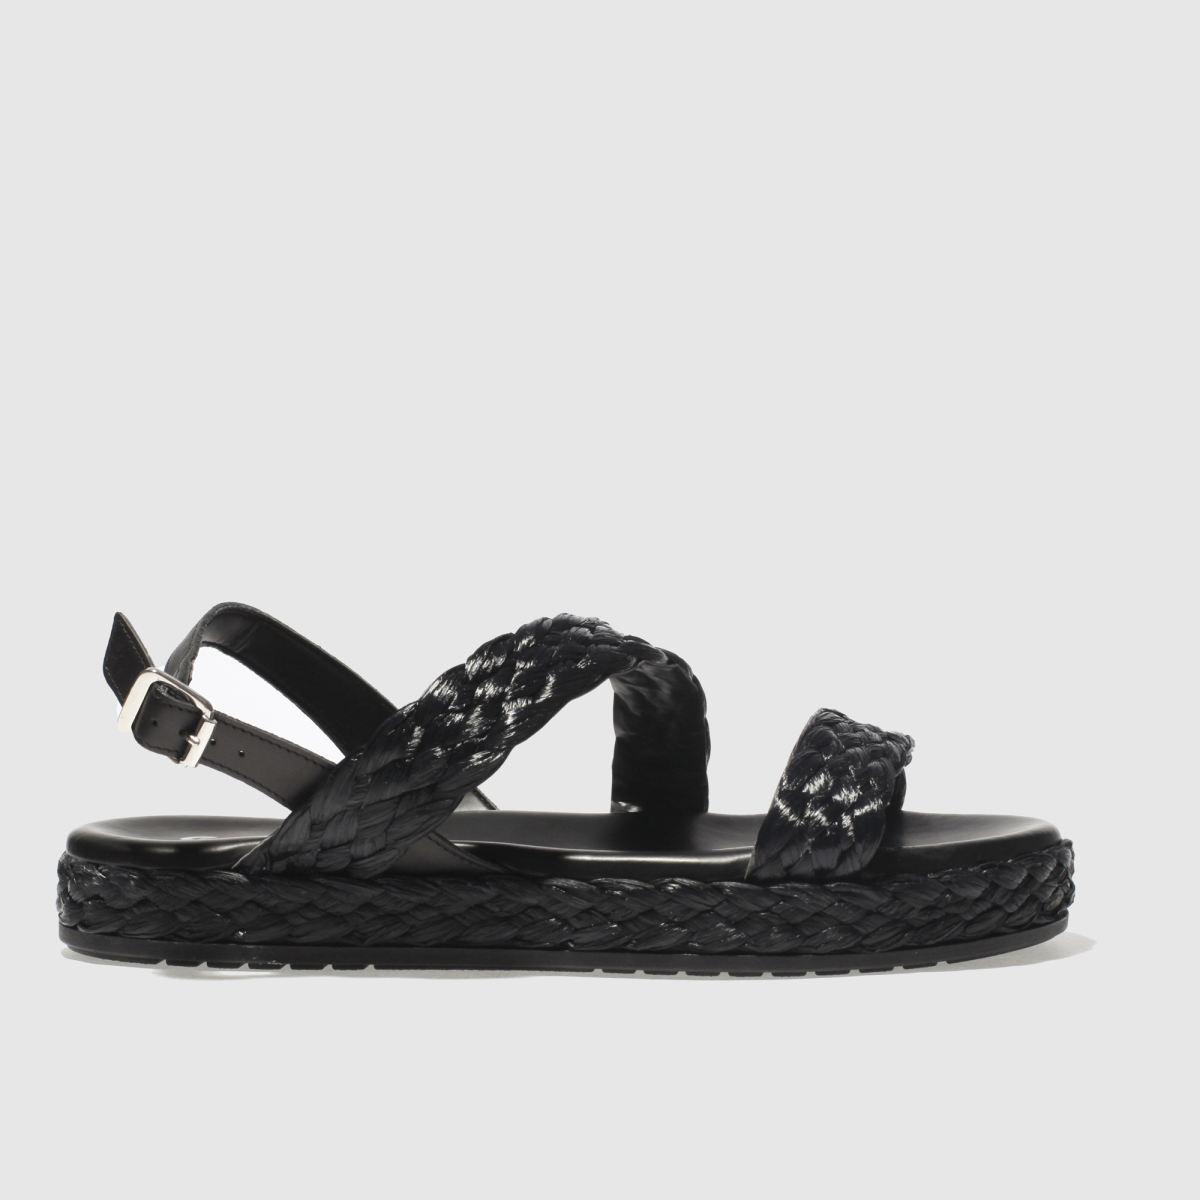 schuh Schuh Black Malta Sandals